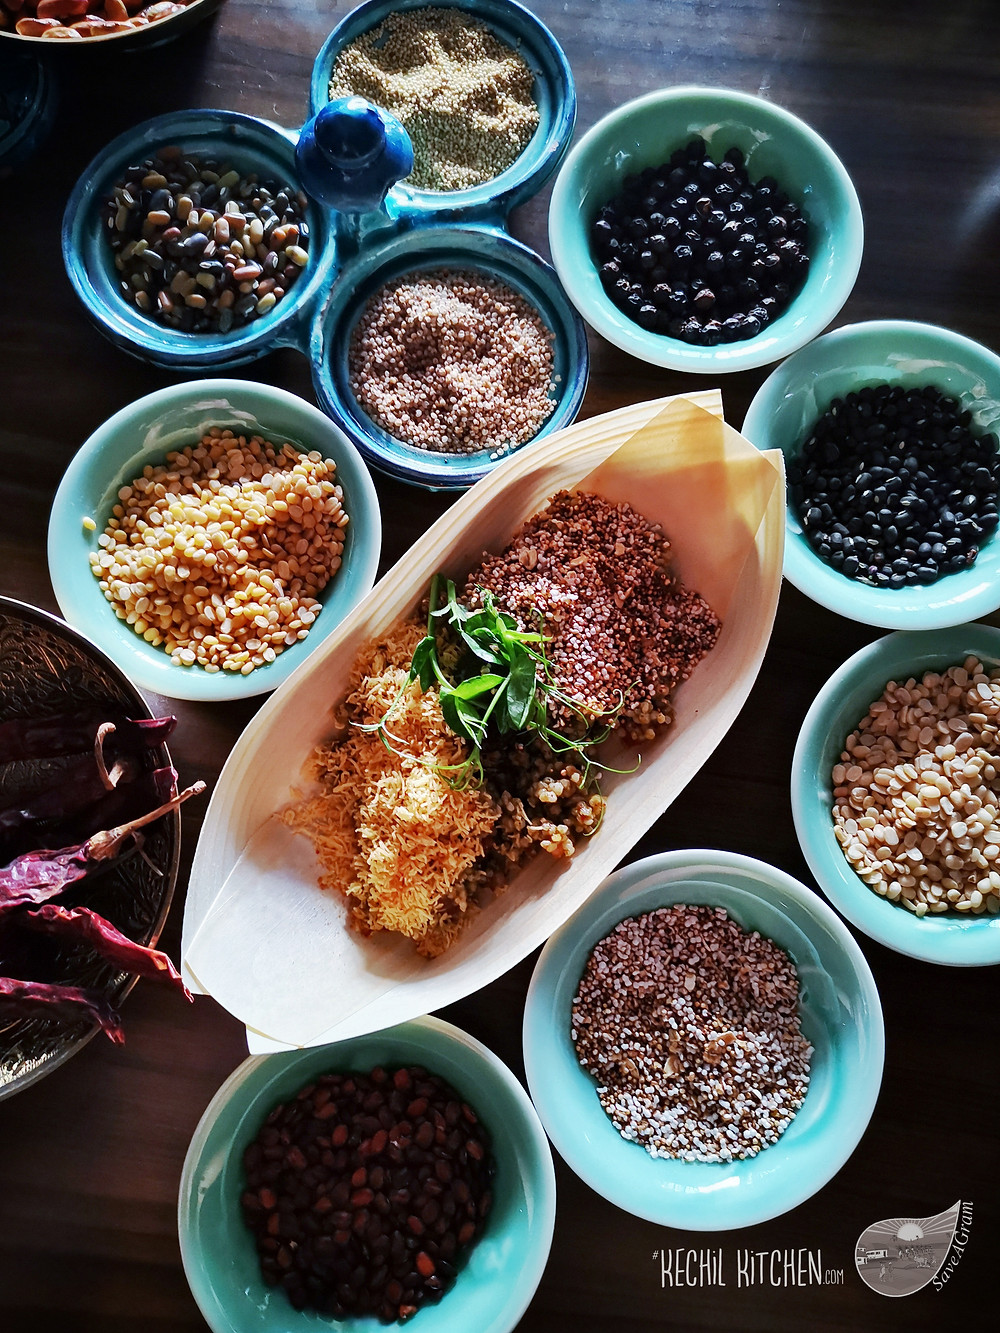 Black Pepper, Urad dal, Amaranth, Barnyard Millet, Black Urad, Naurangi Dal, Fenugreek seeds, Red Chilli